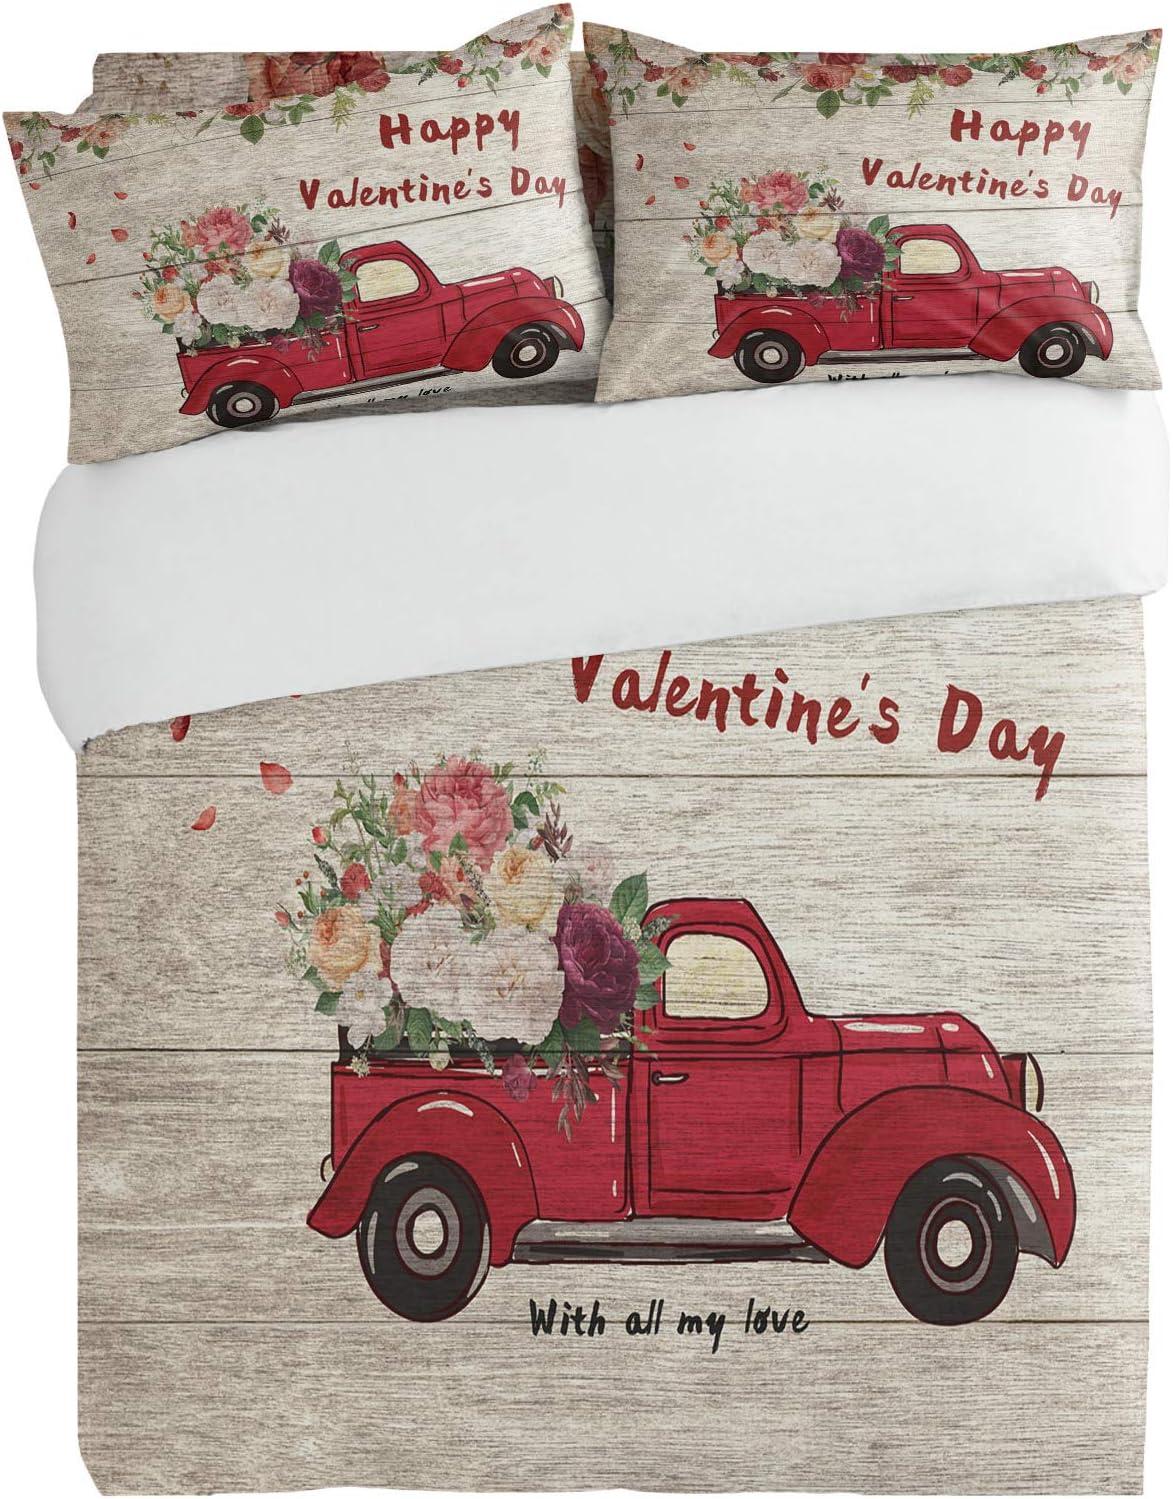 SUN-Shine 3PiecesBeddingDuvetCoverSet Now free shipping Romantic Ros Blooming High material